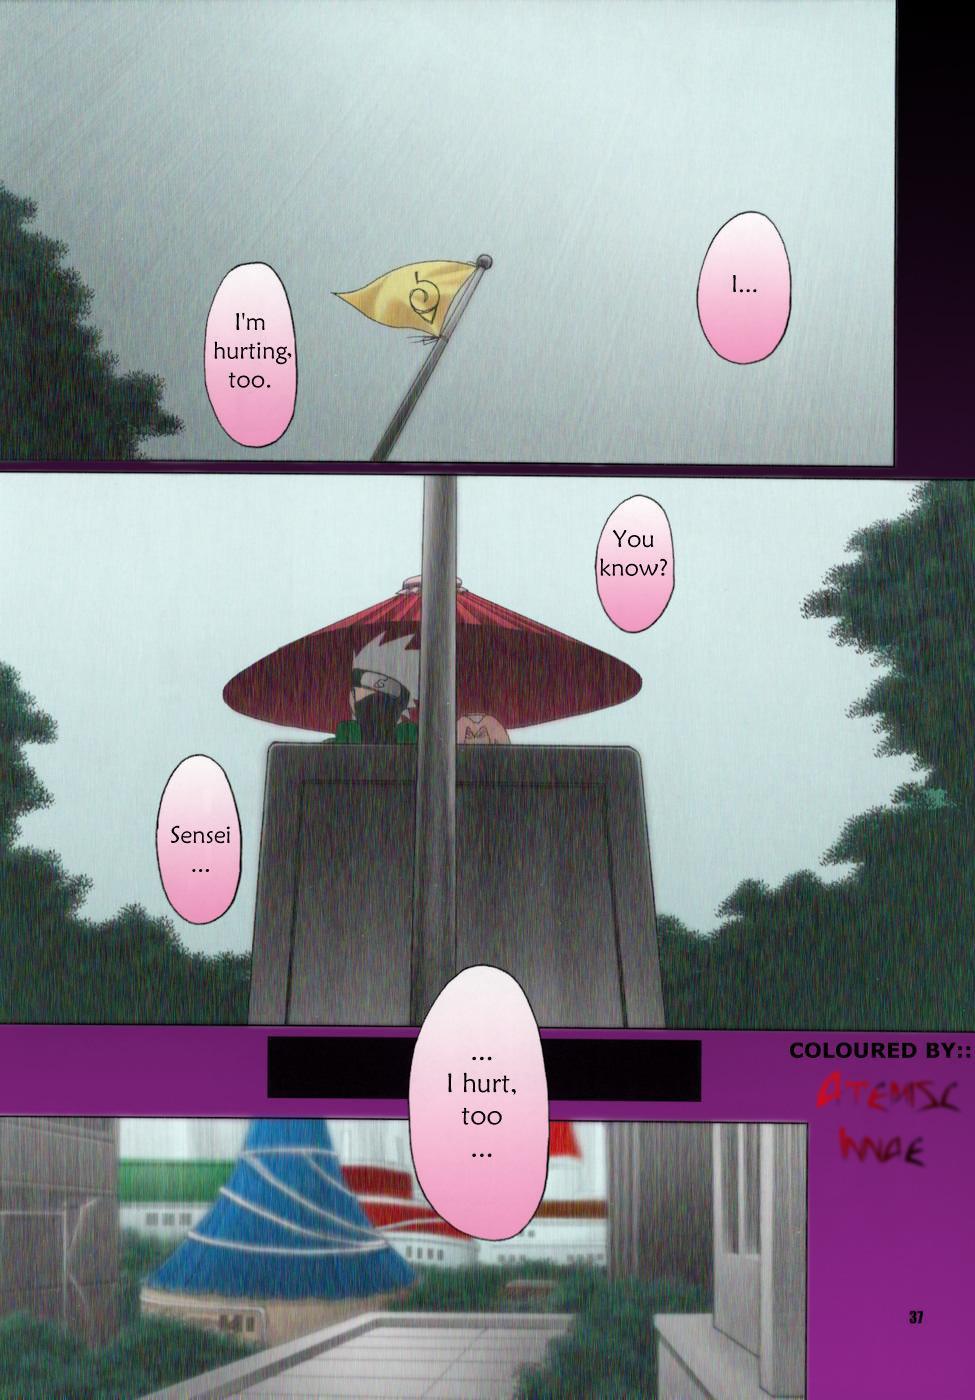 Himitsu - The Secret 22